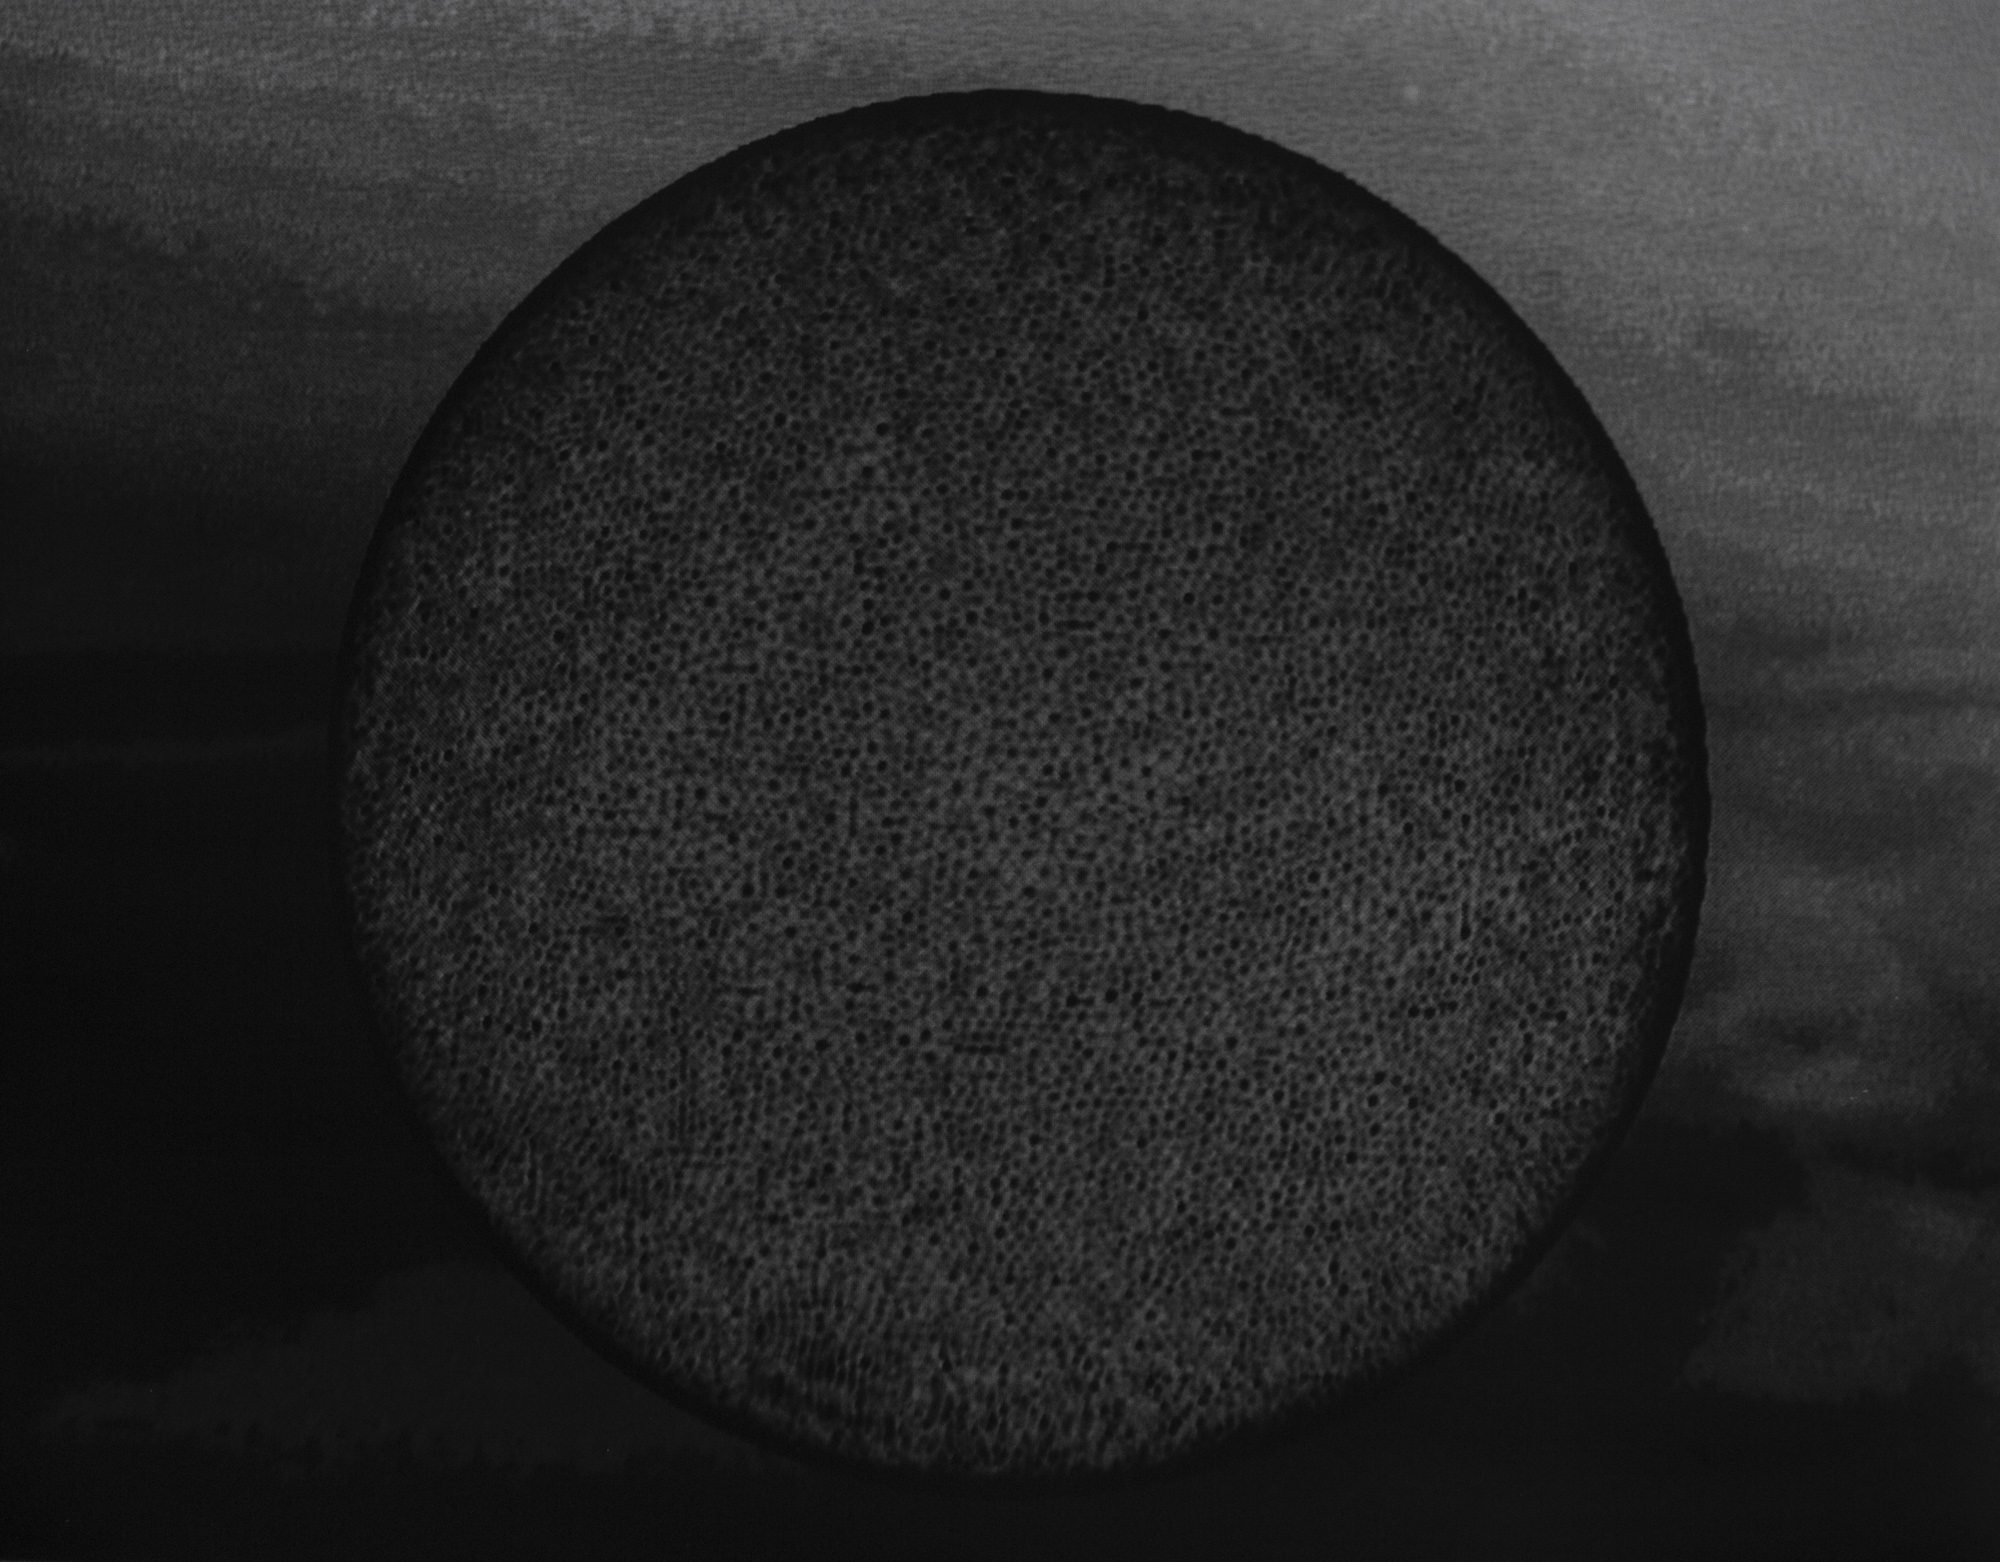 RRodner-Dichotomies-code landscapes-6.jpg